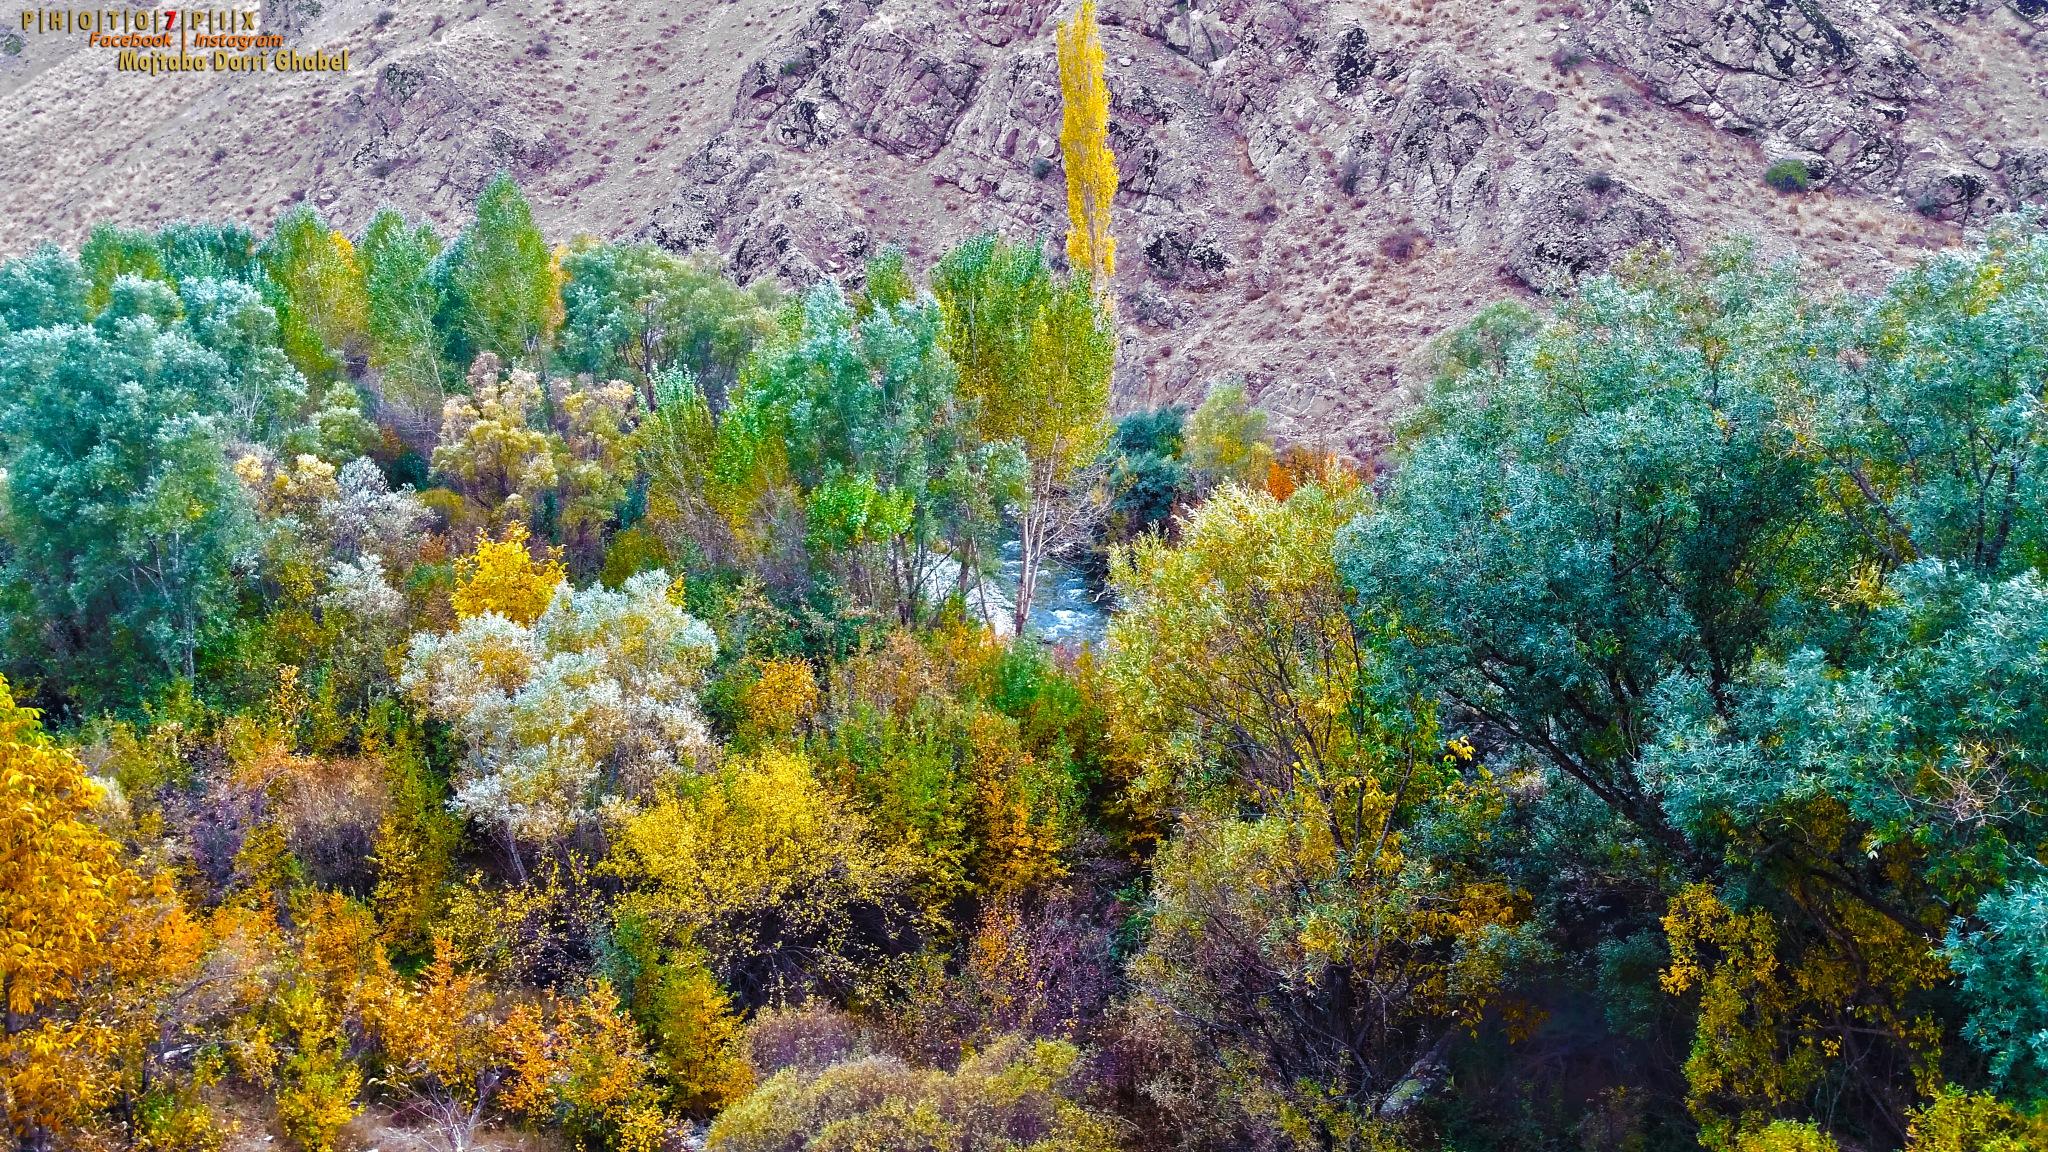 Autumn by mojtabadorri